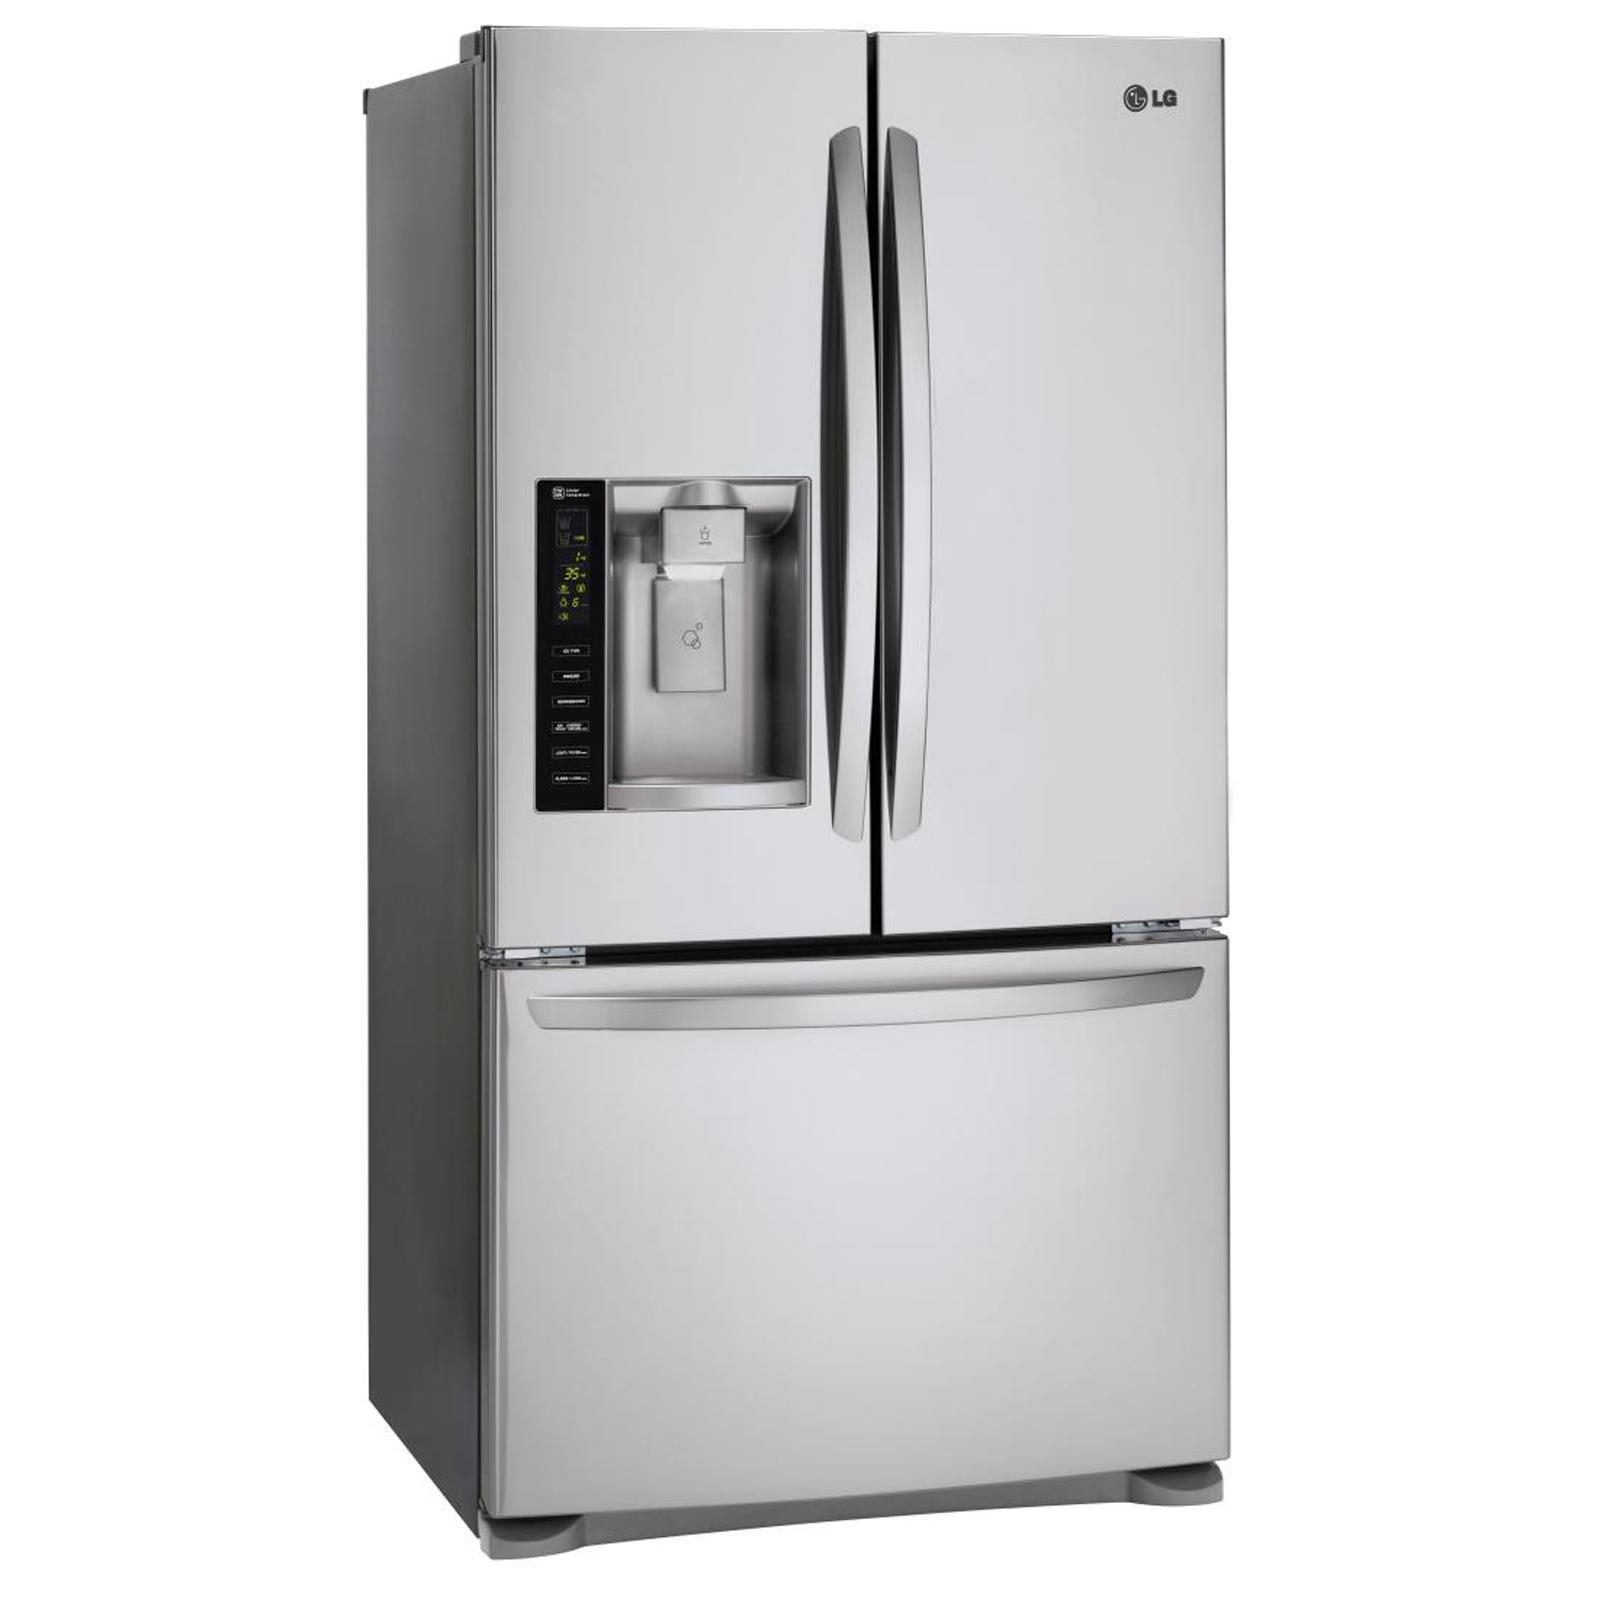 LG 20.5 cu. ft. Counter-Depth French-Door Bottom-Freezer Refrigerator